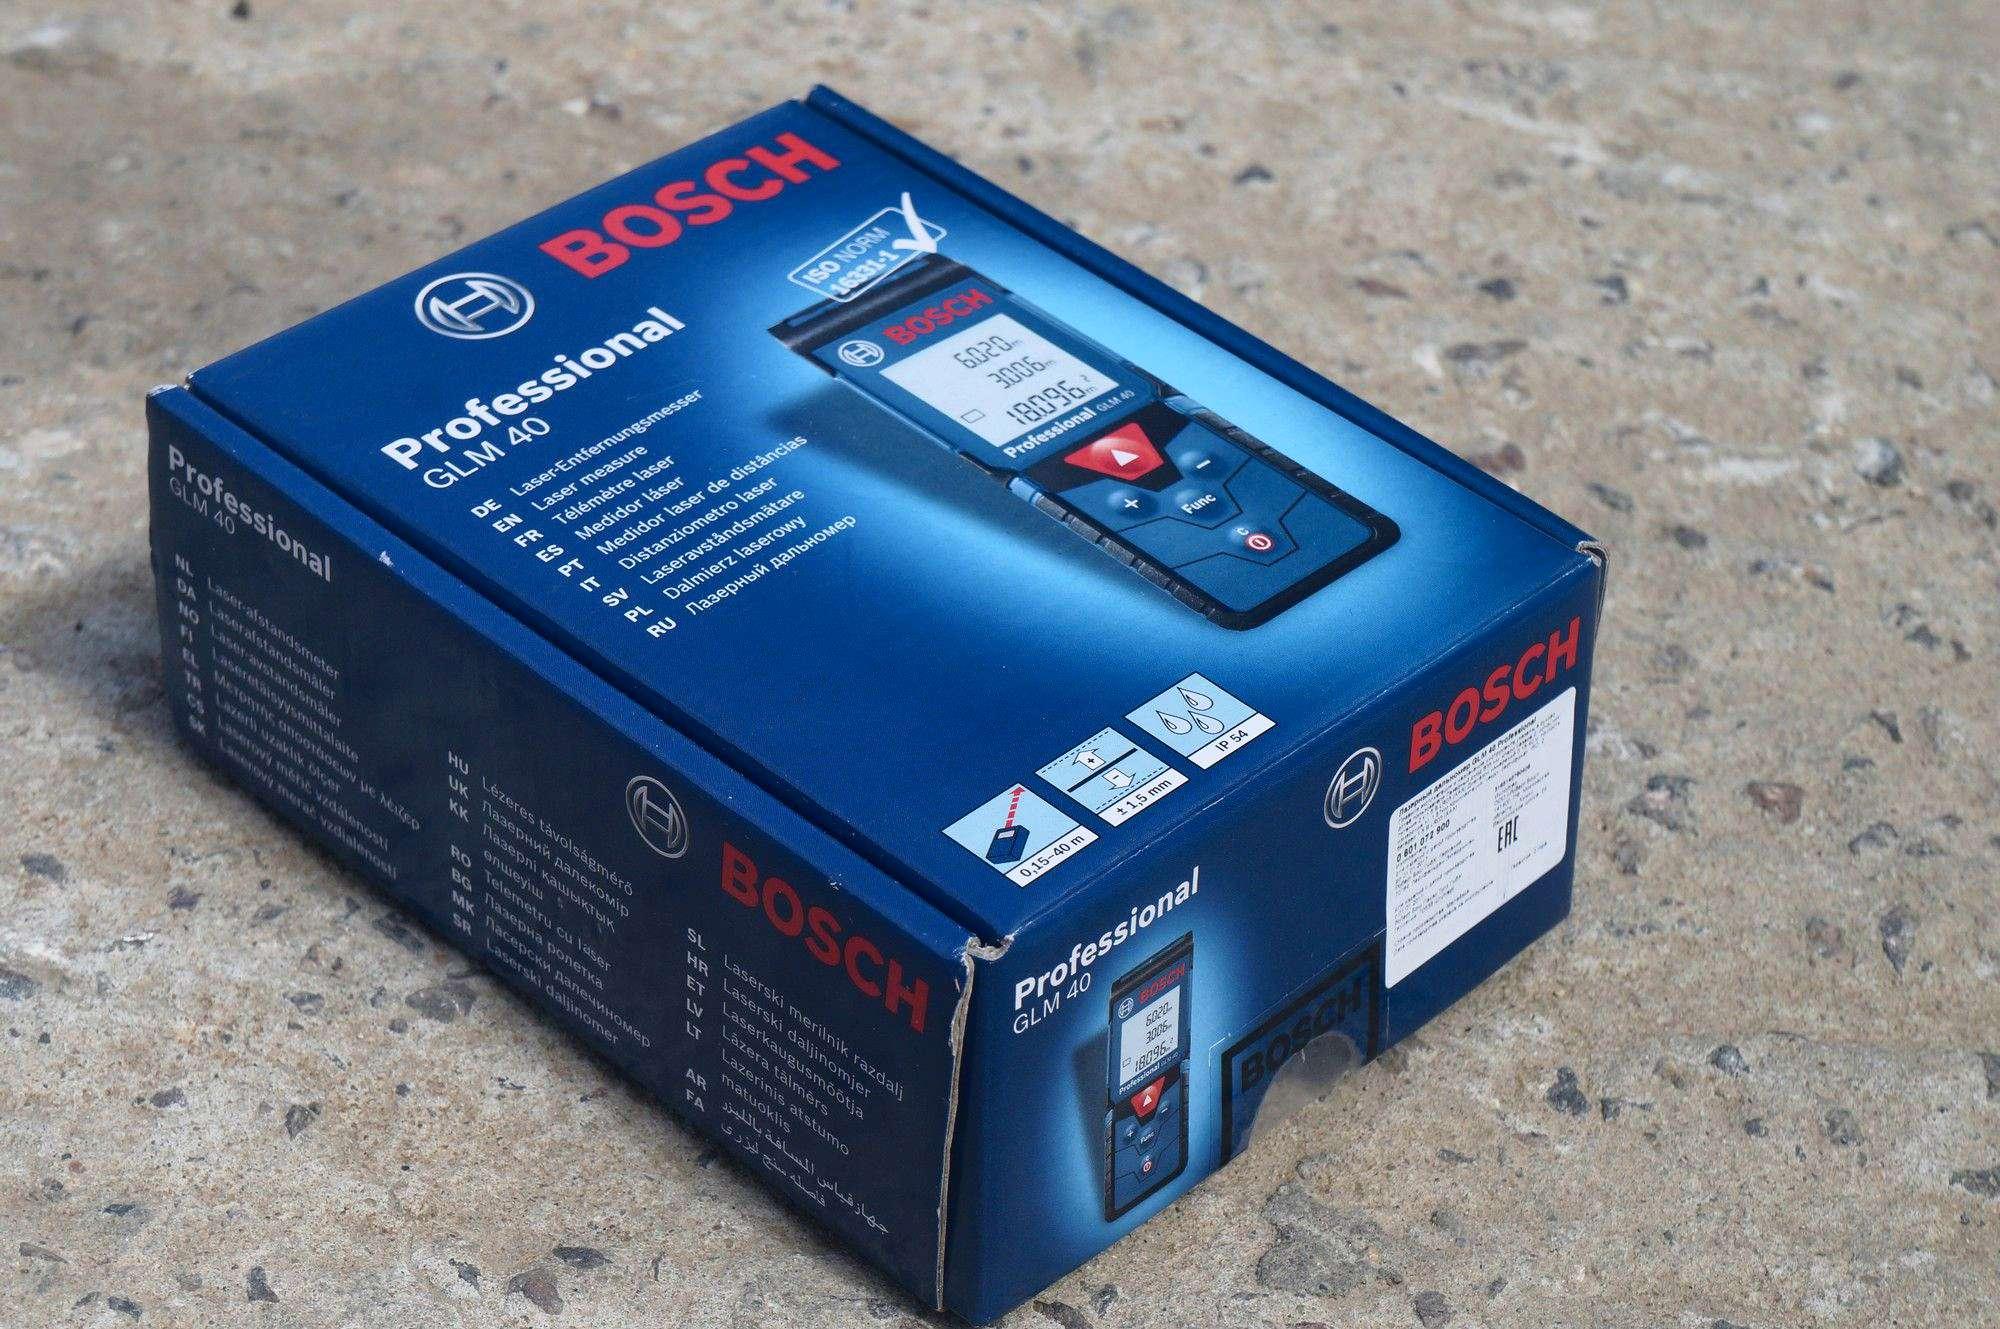 Laser Entfernungsmesser Bosch Glm 40 : Дальномер лазерный bosch glm professional